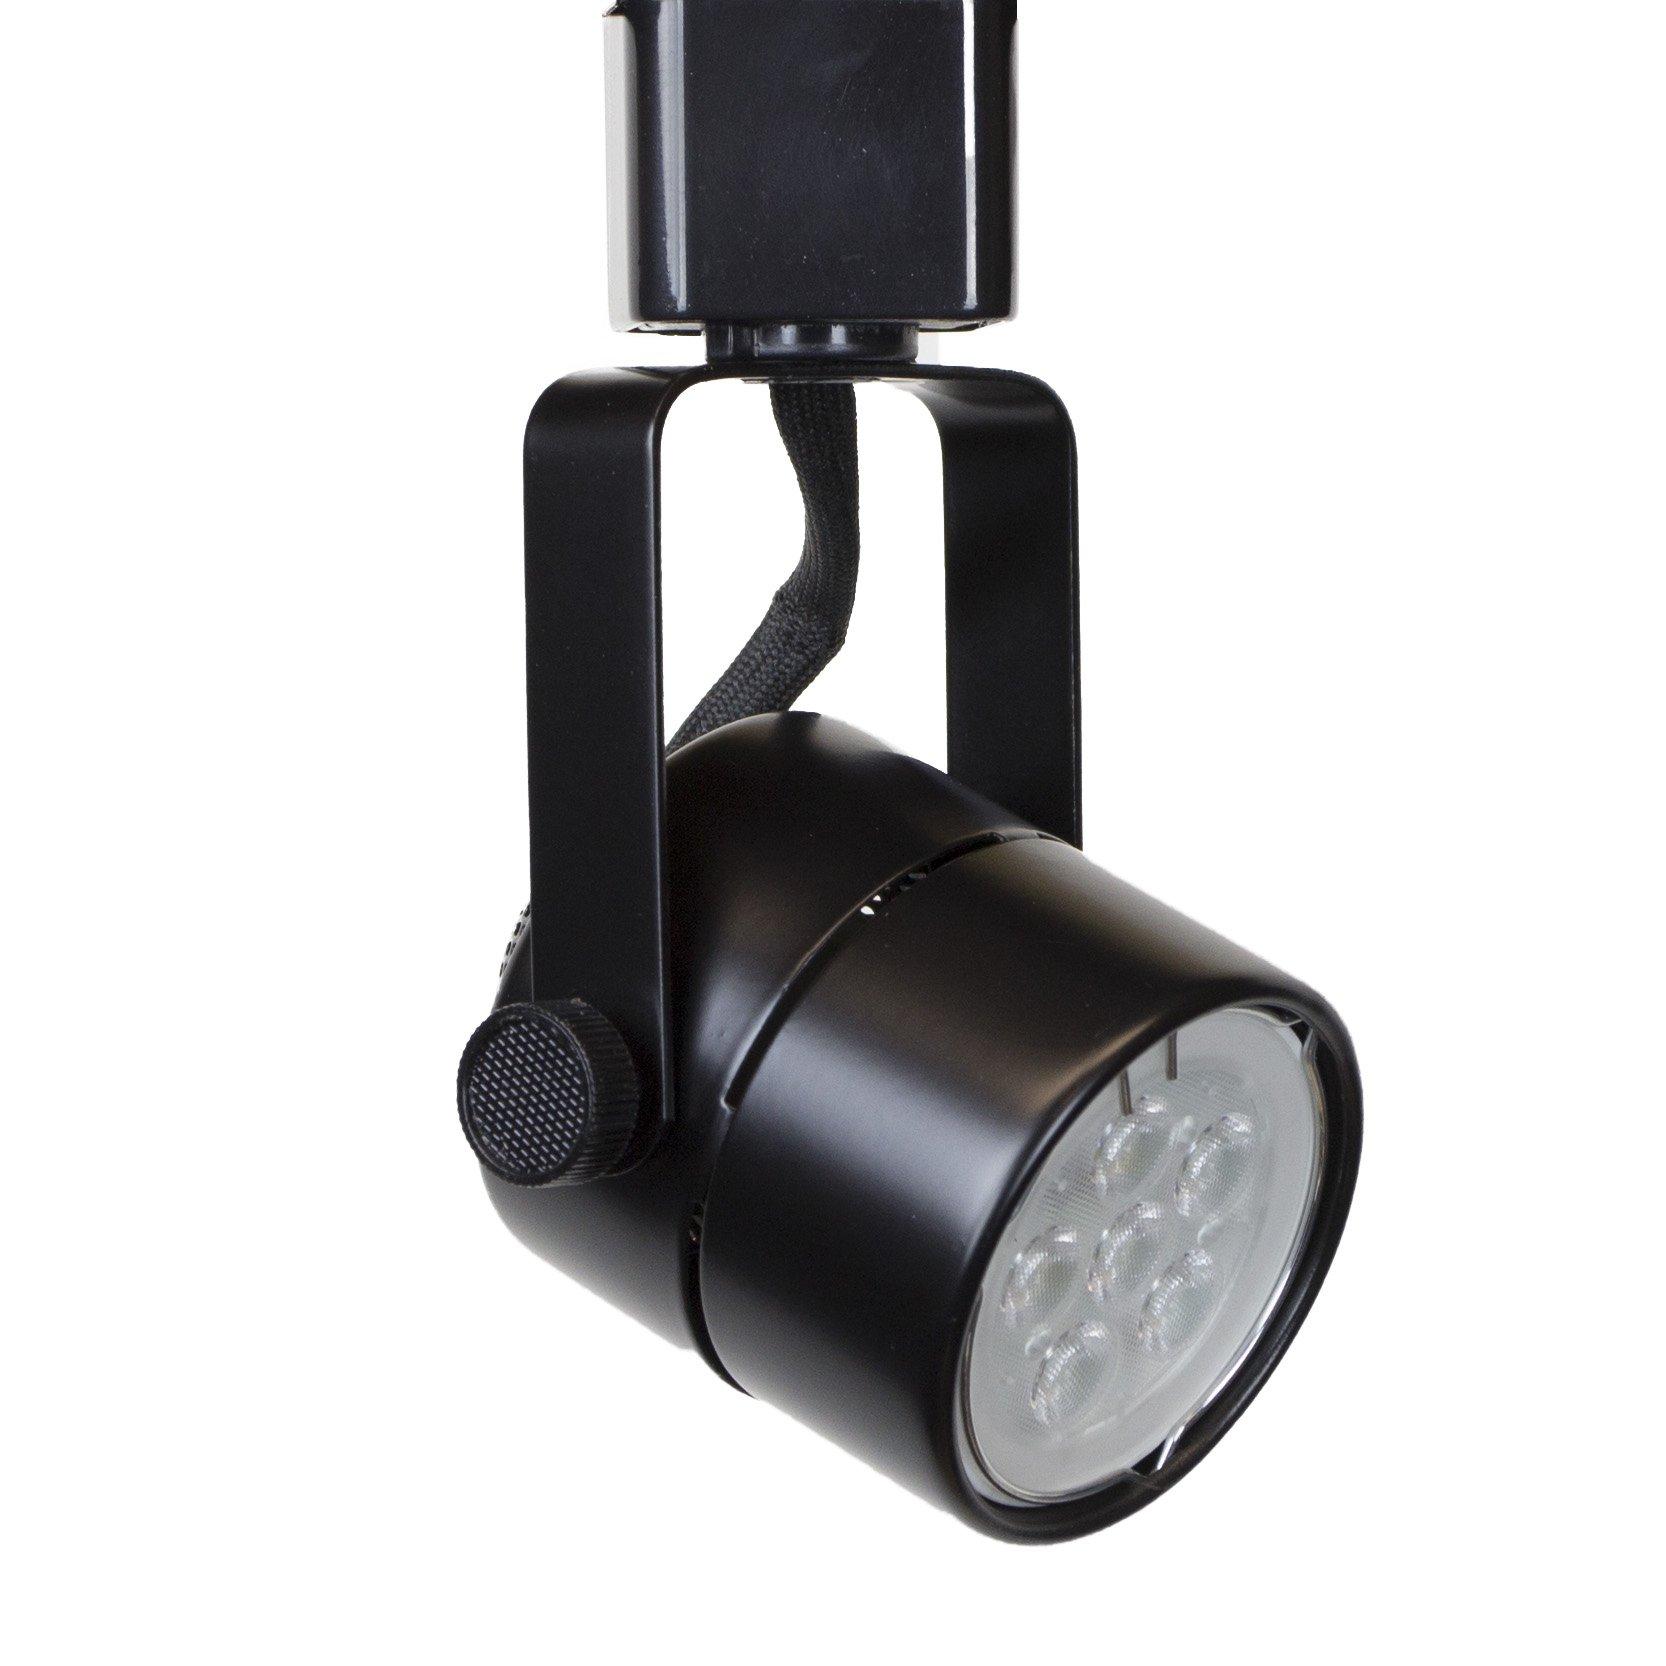 Direct-Lighting H System 3000K GU10 LED Track Lighting Head Black - With 3000K Warm White 7.5W LED Bulb 50154L